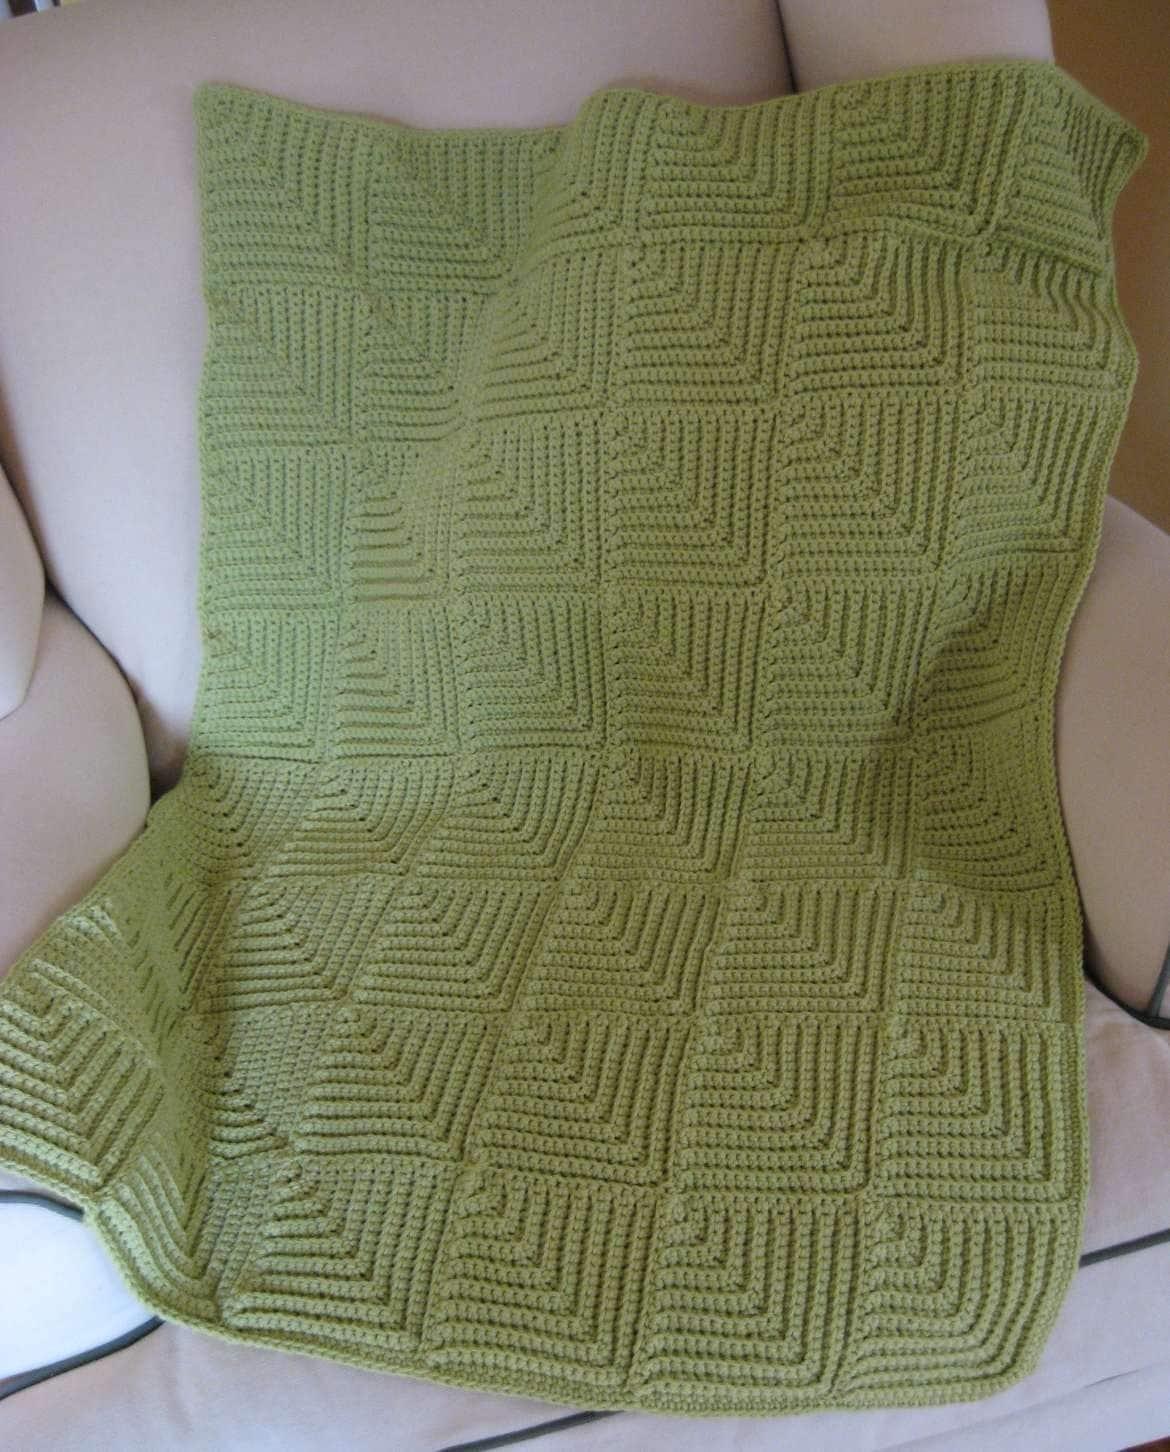 Domino Knitting Blanket Pattern : Mitered Squares Crocheted Baby Blanket